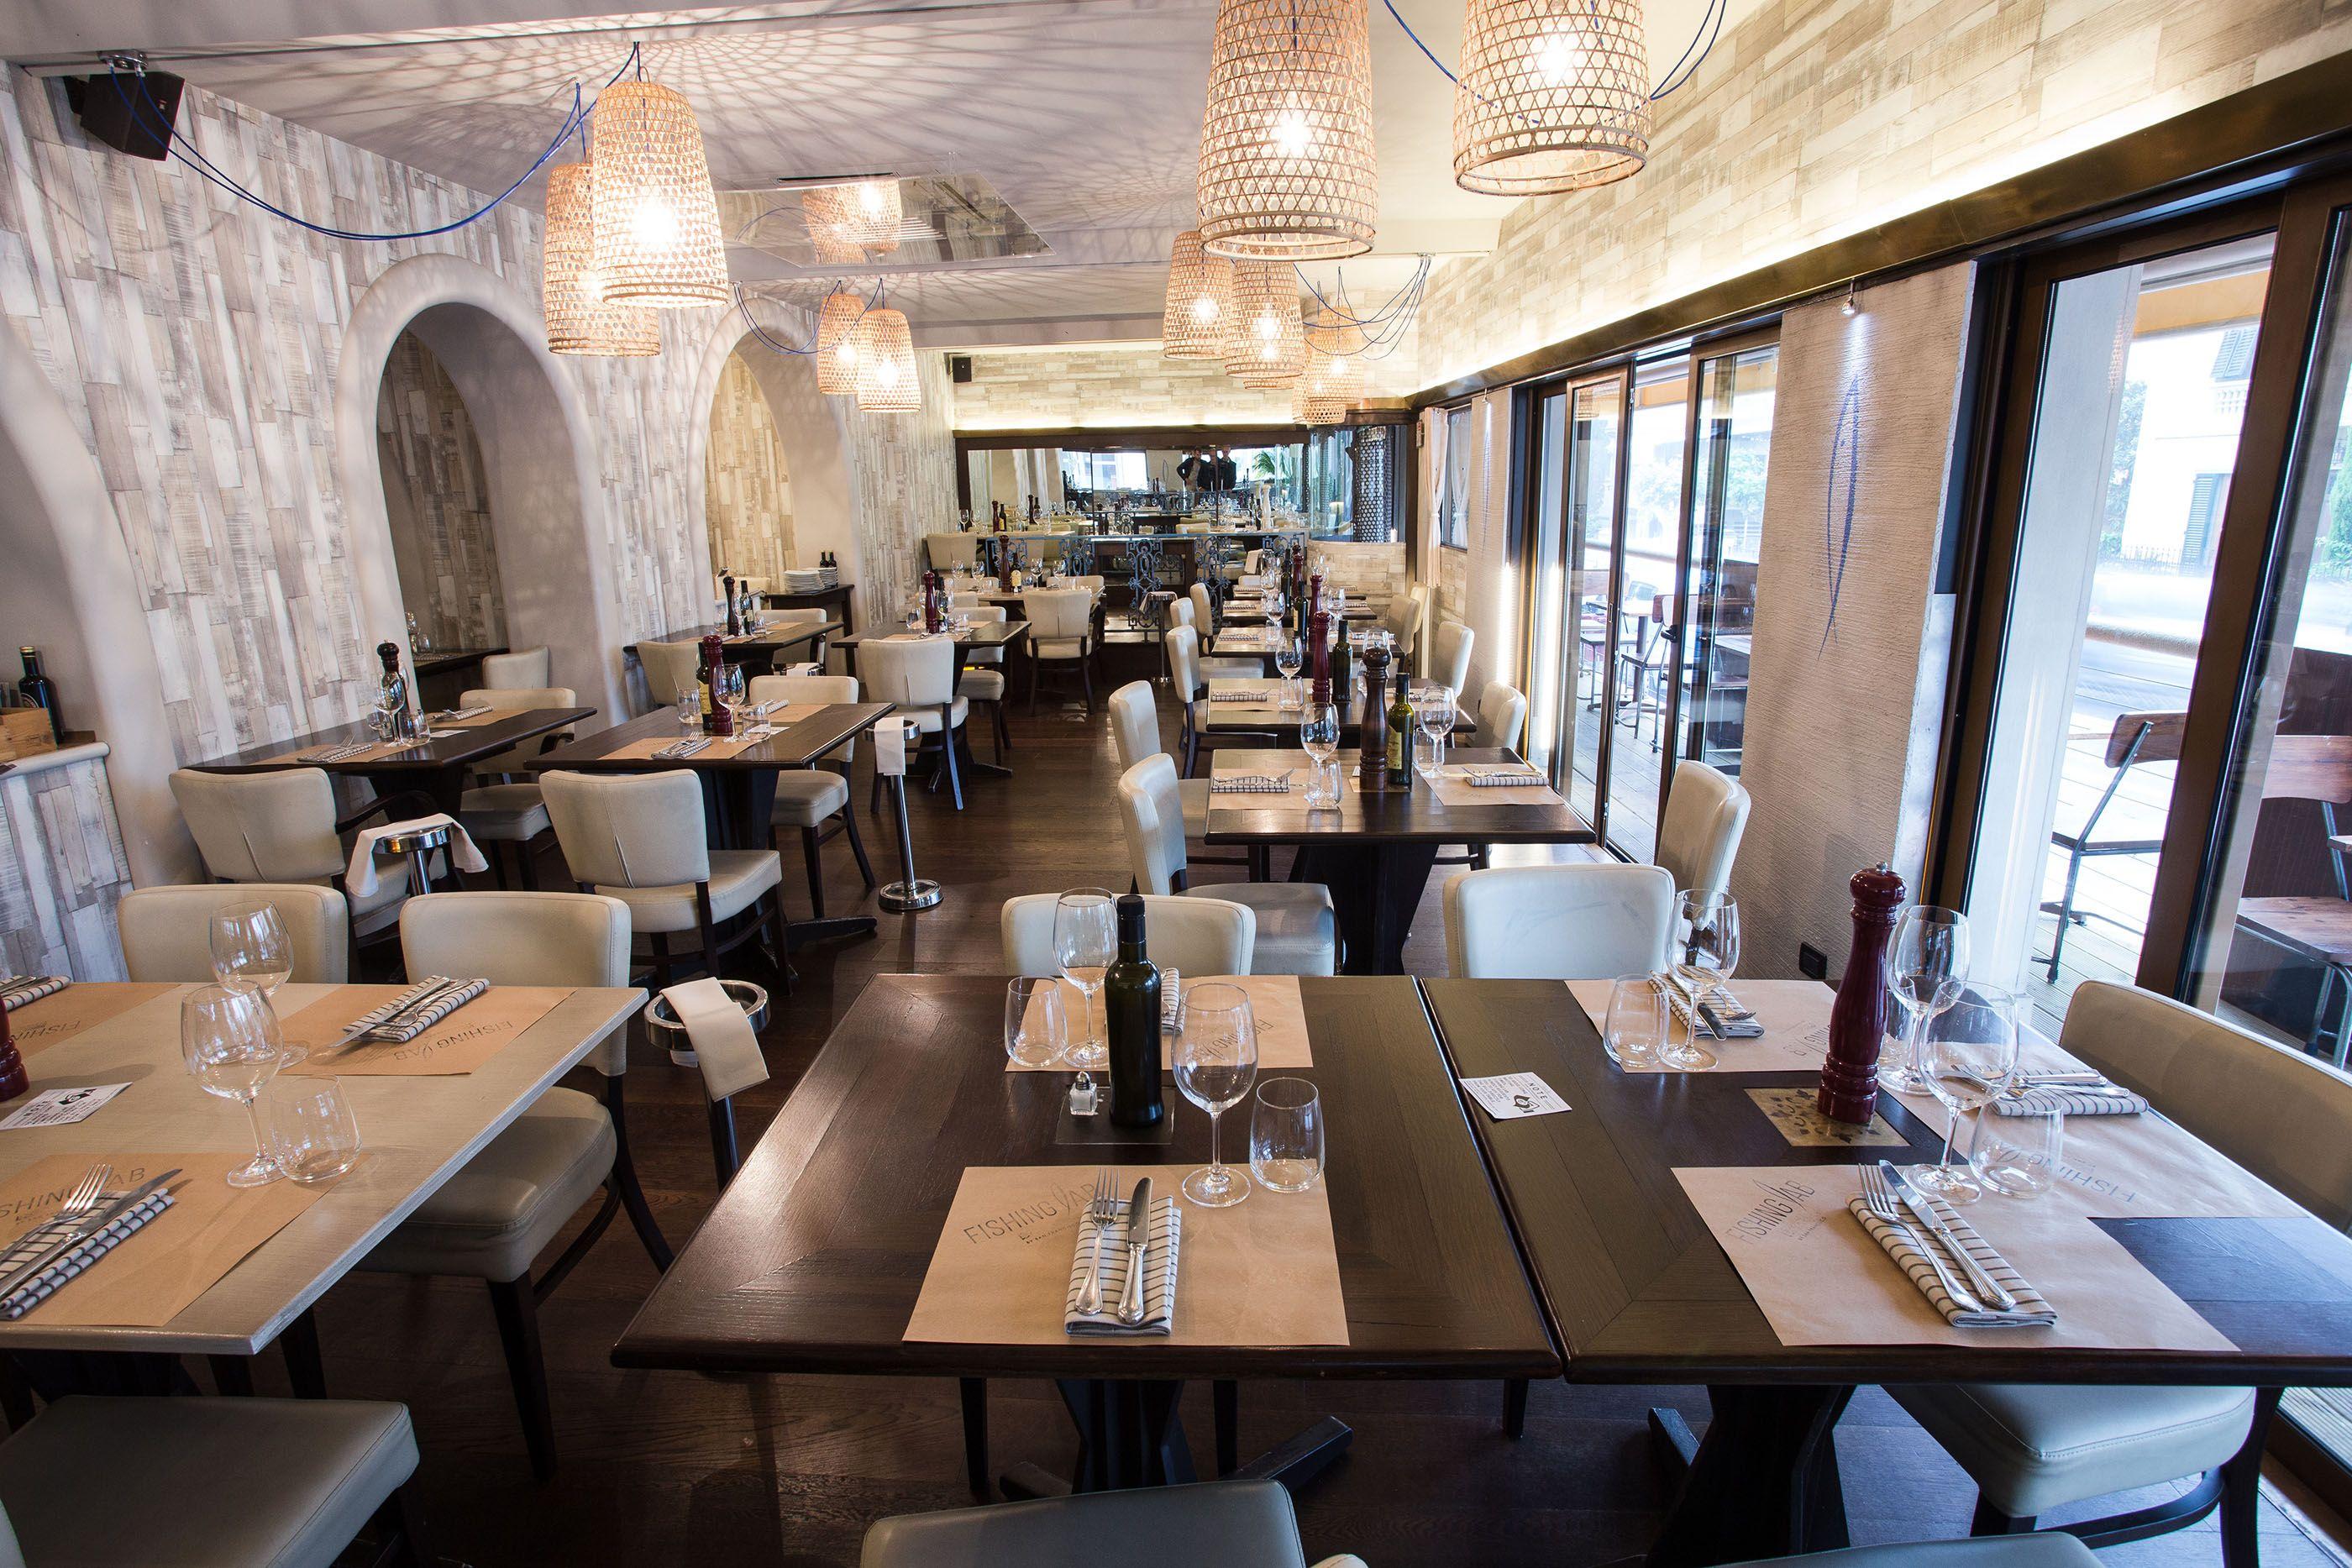 Interni interni salone tavoli ristorante montecatini for Interni salone